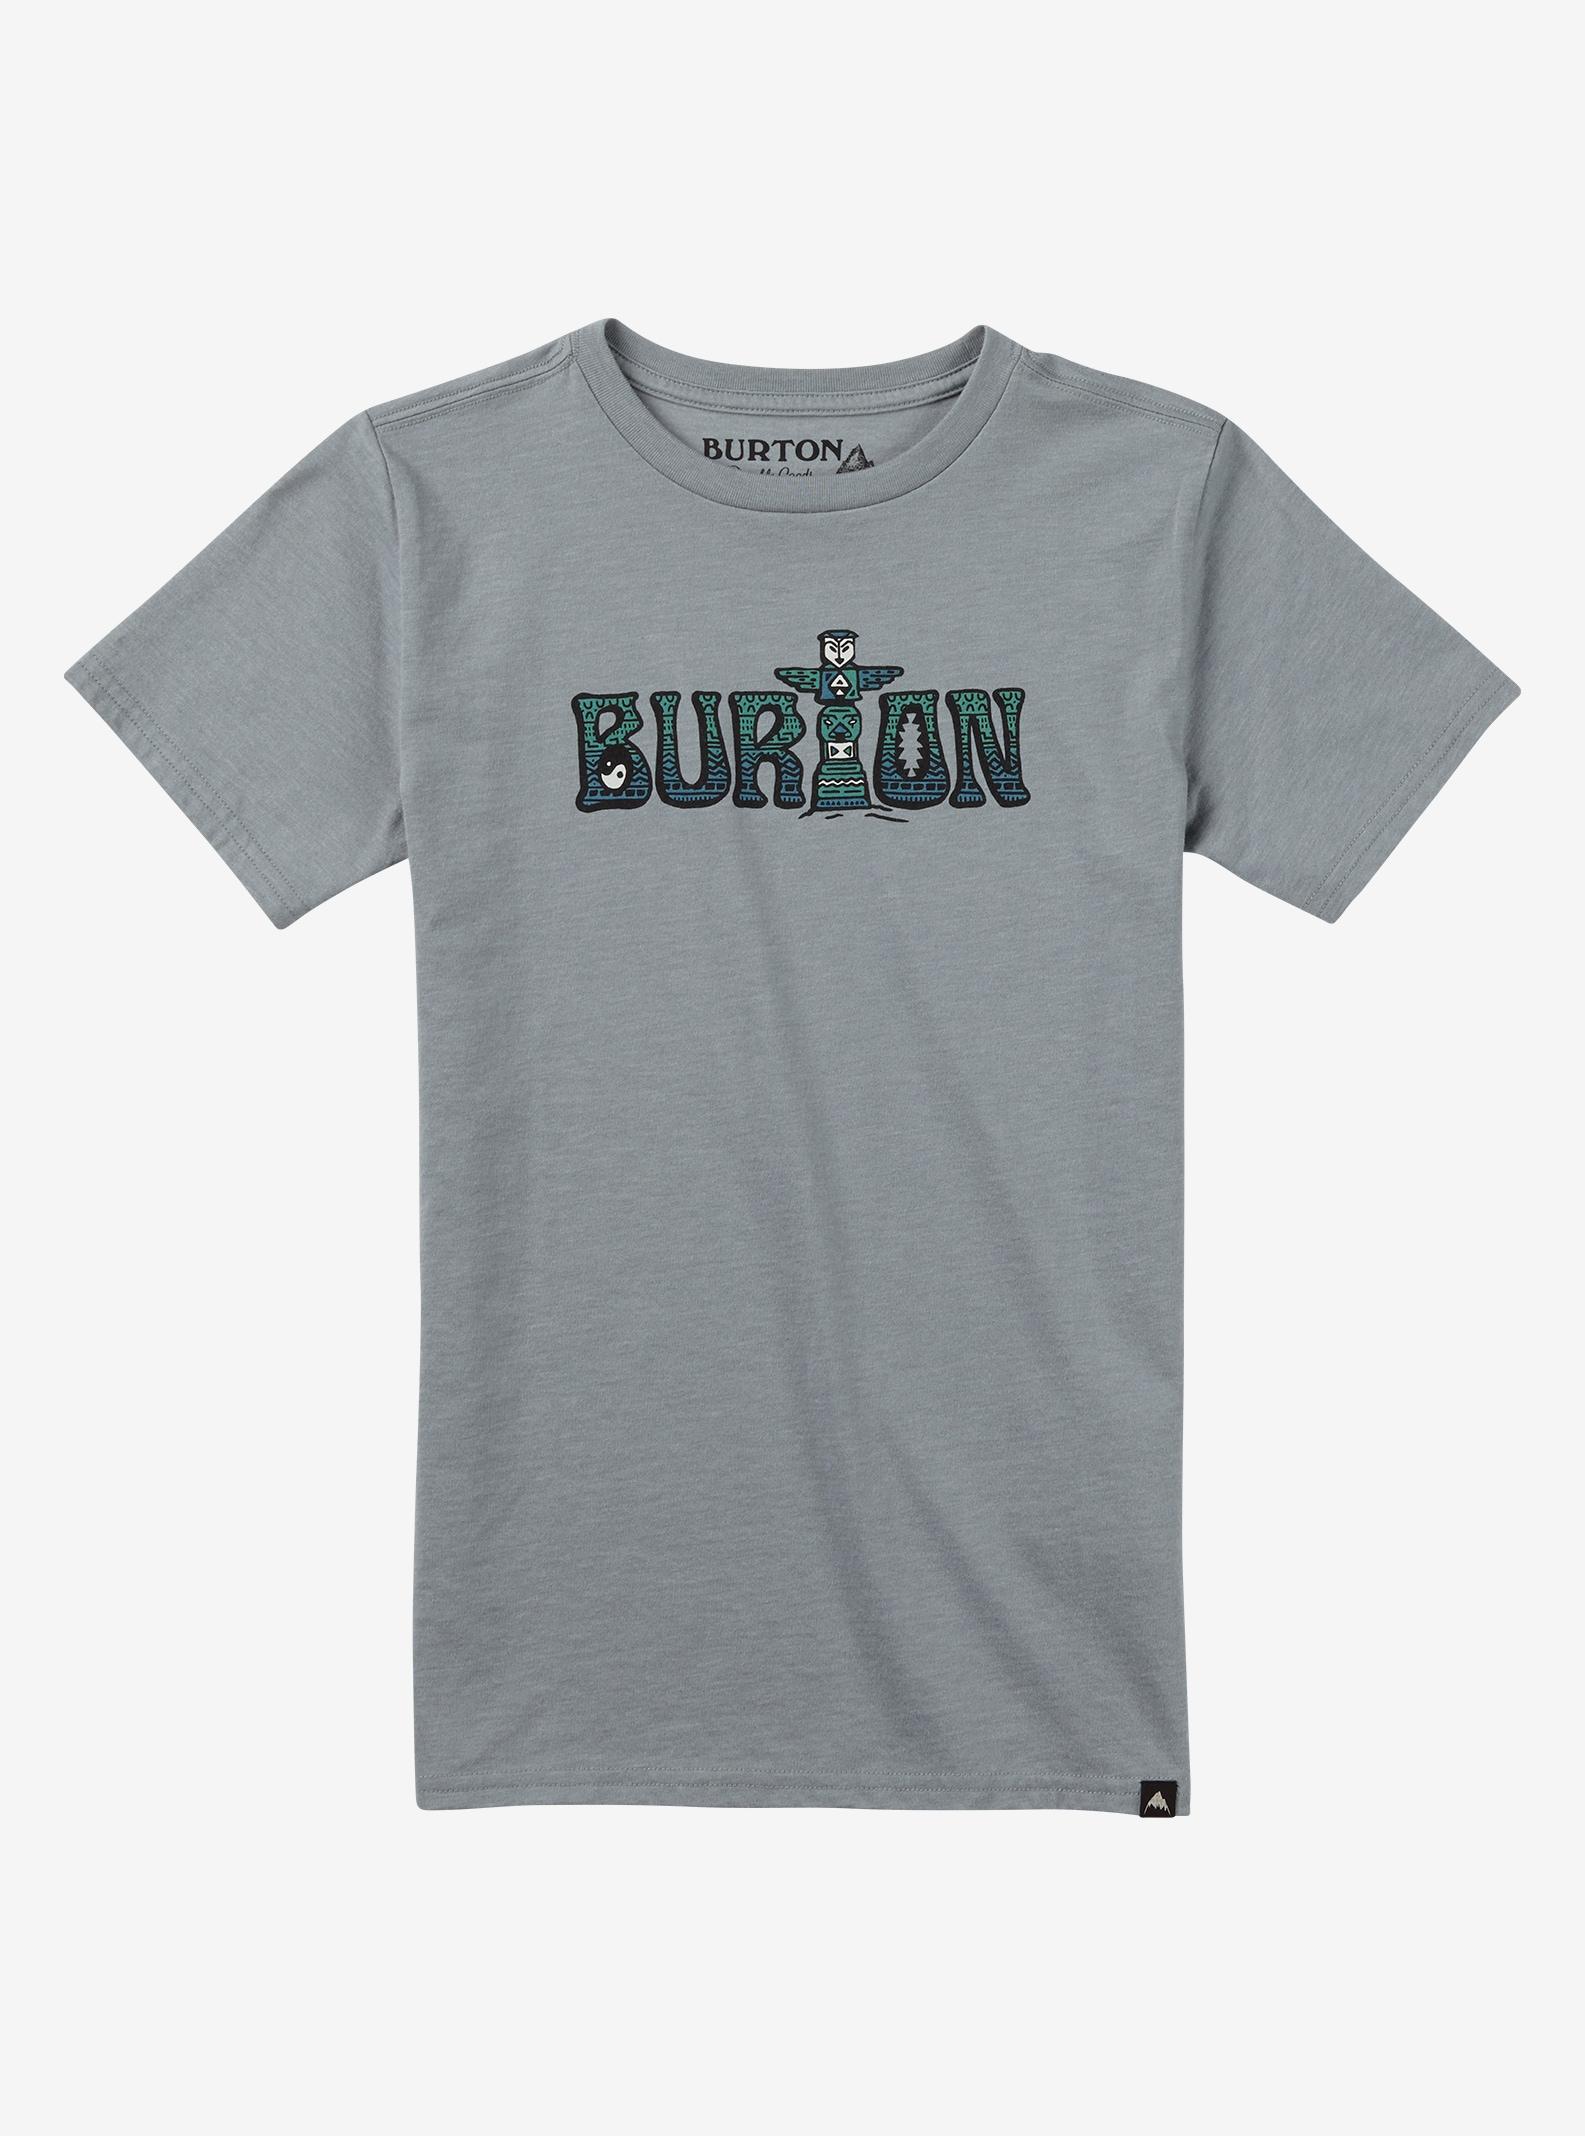 Burton Boys' Wild Child Short Sleeve T Shirt shown in Gray Heather